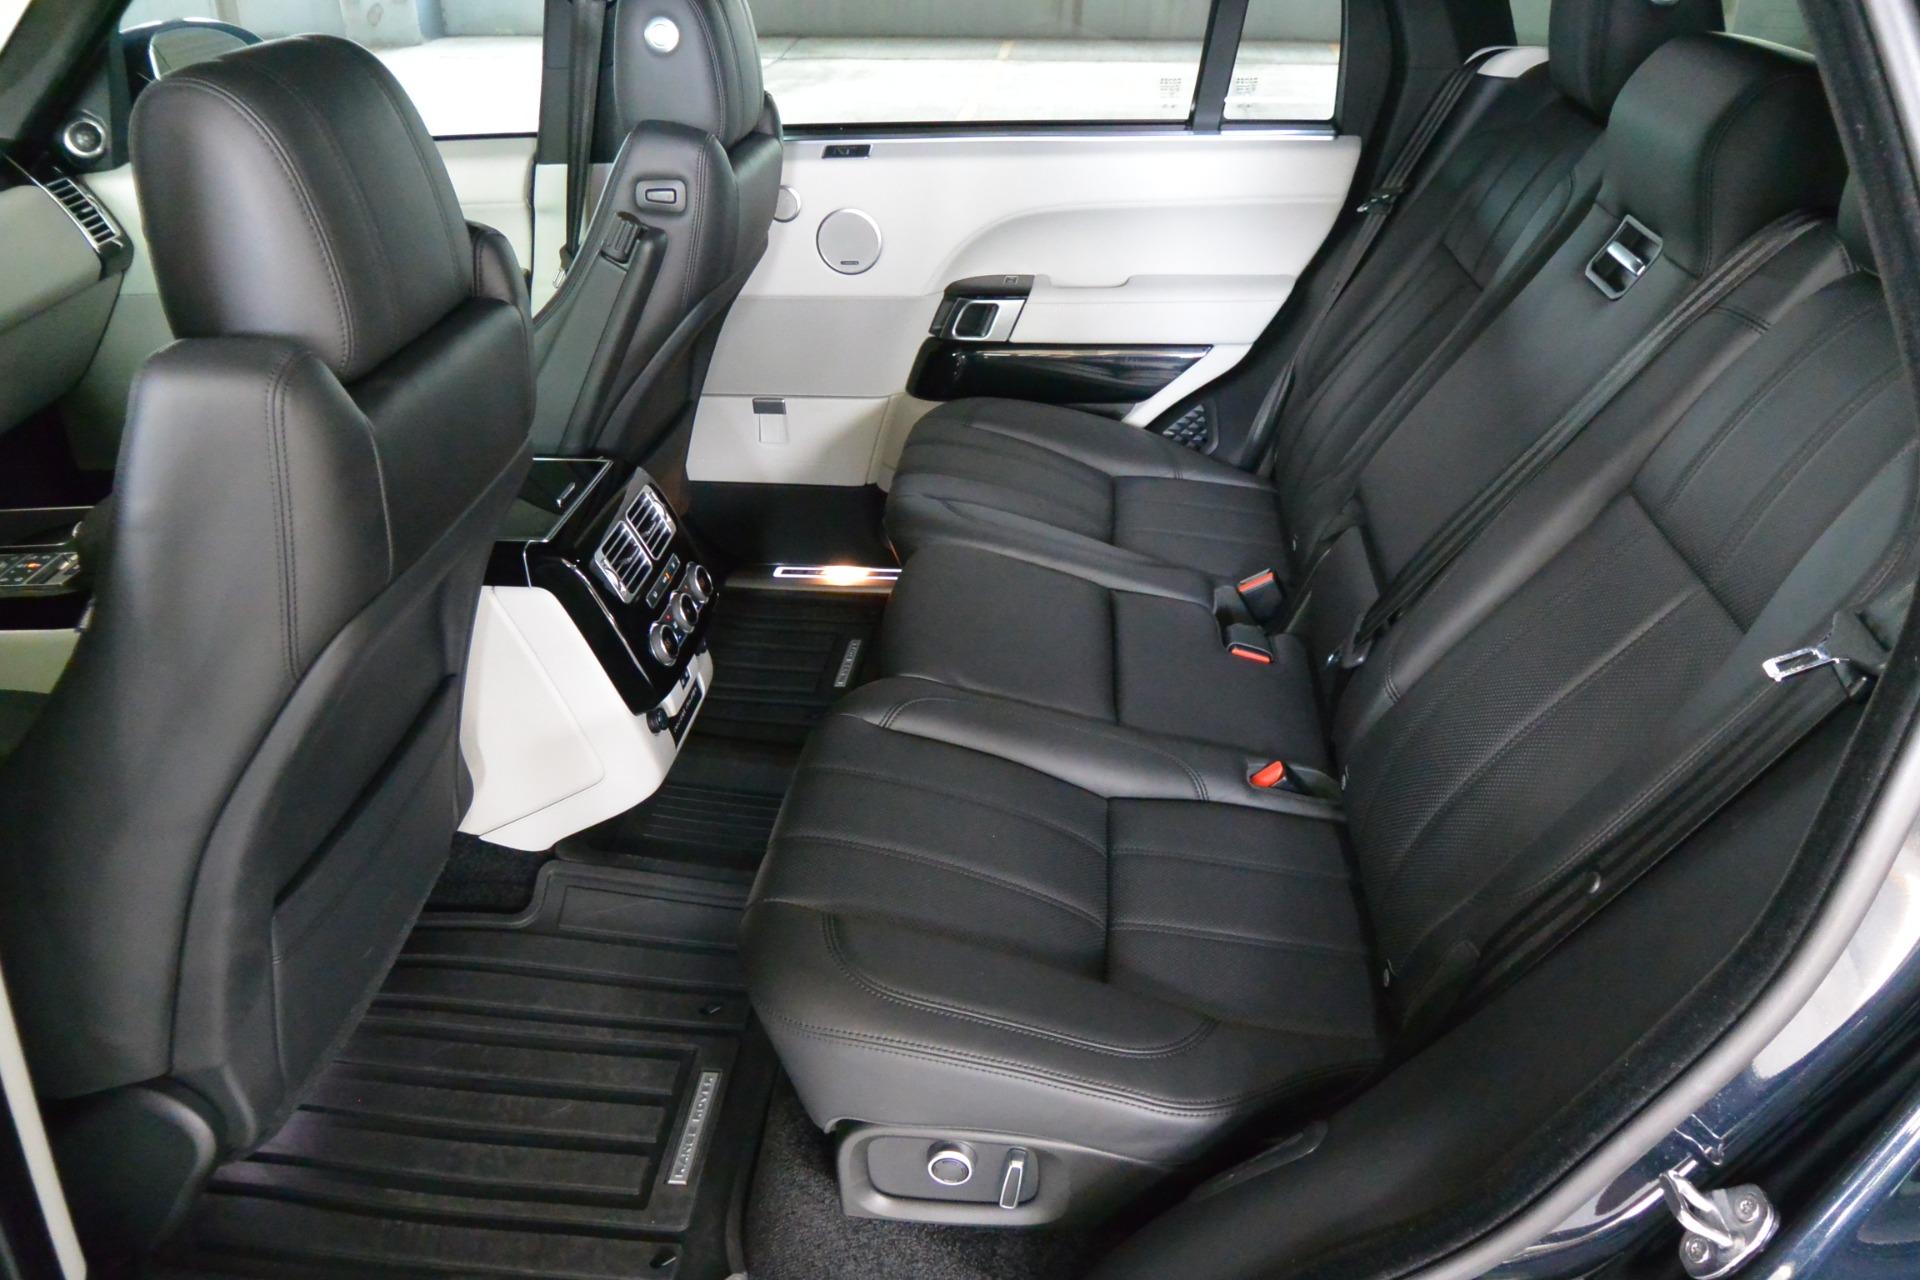 Used-2017-Land-Rover-Range-Rover-LWB-Jackson-MS